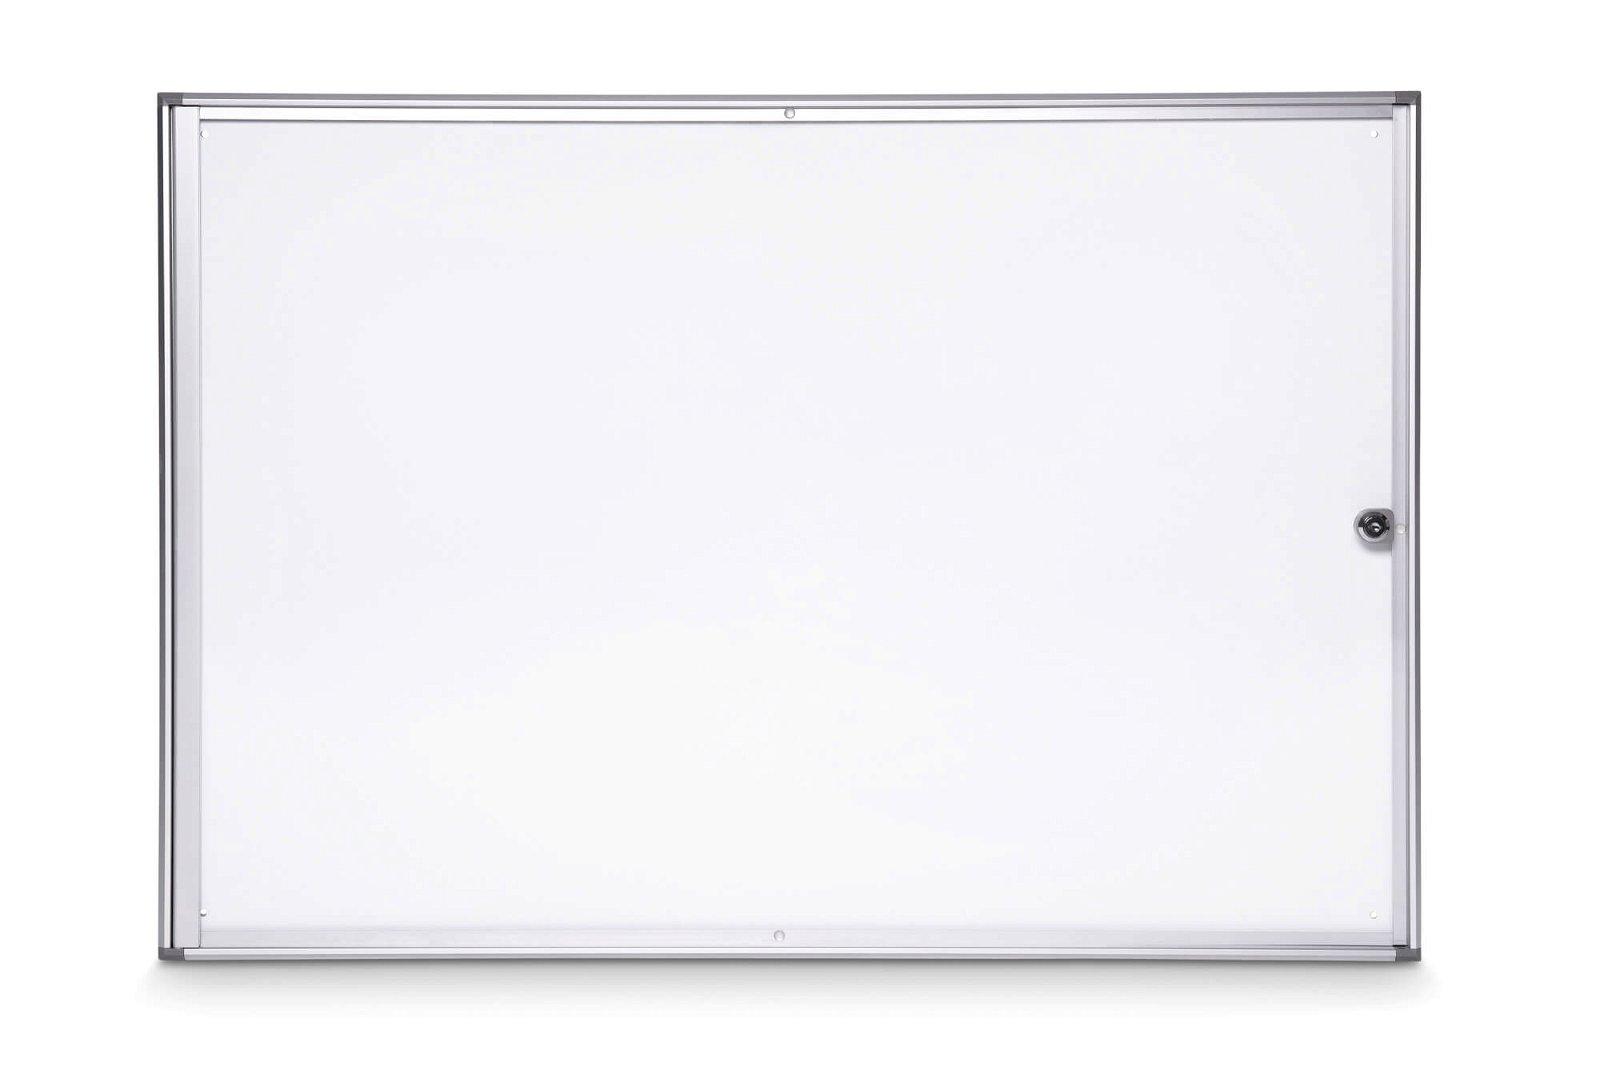 Schaukasten MAULextraslim, 8 x A4, aluminium